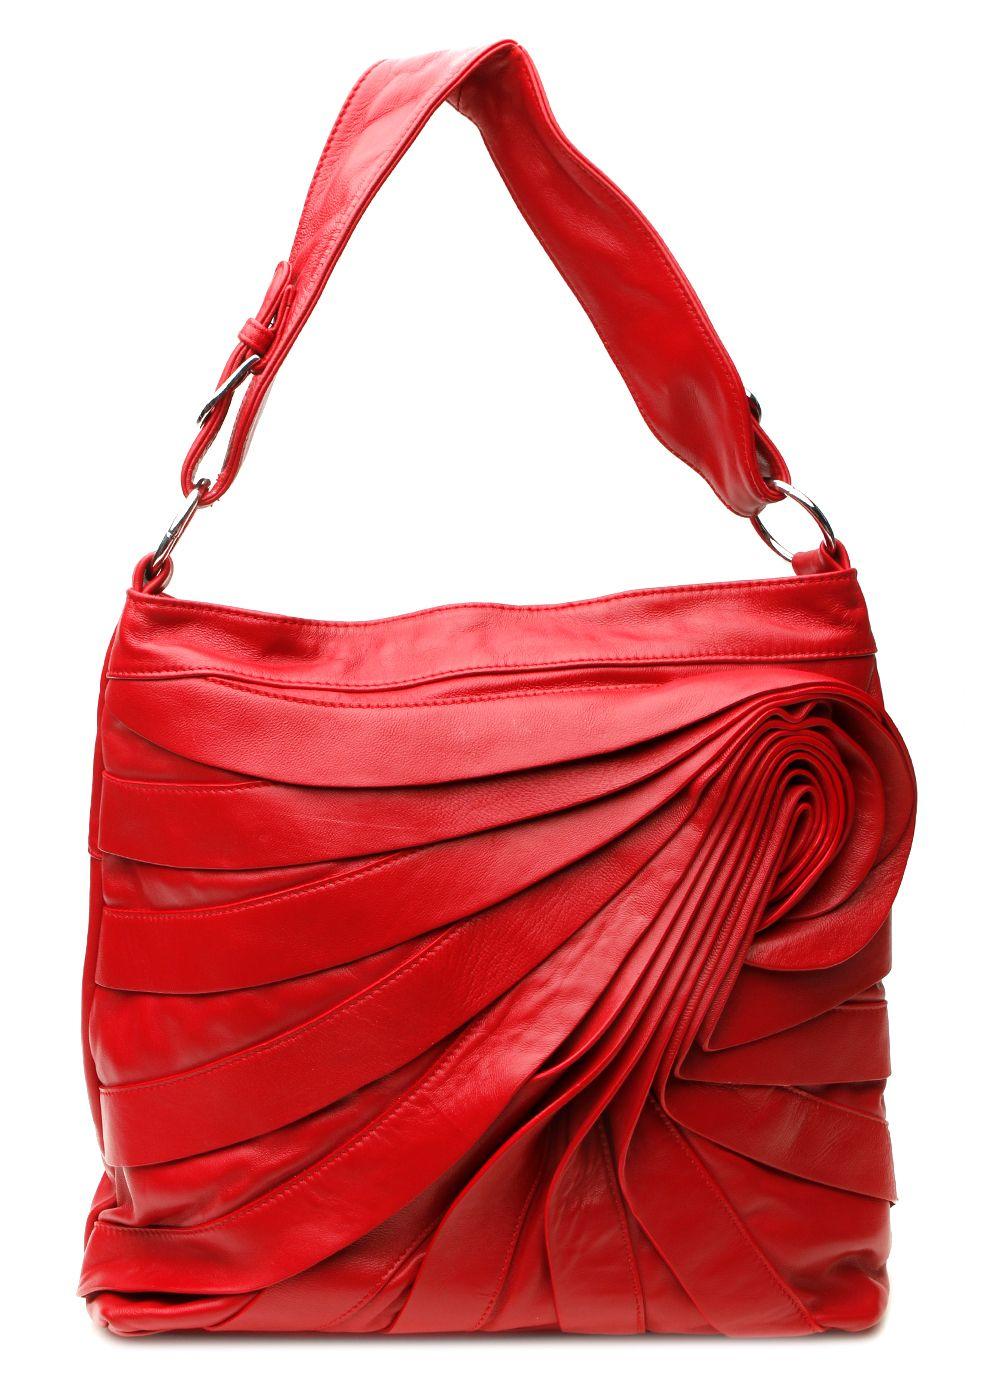 Ada G Handbags Leather Hobo Bag Red